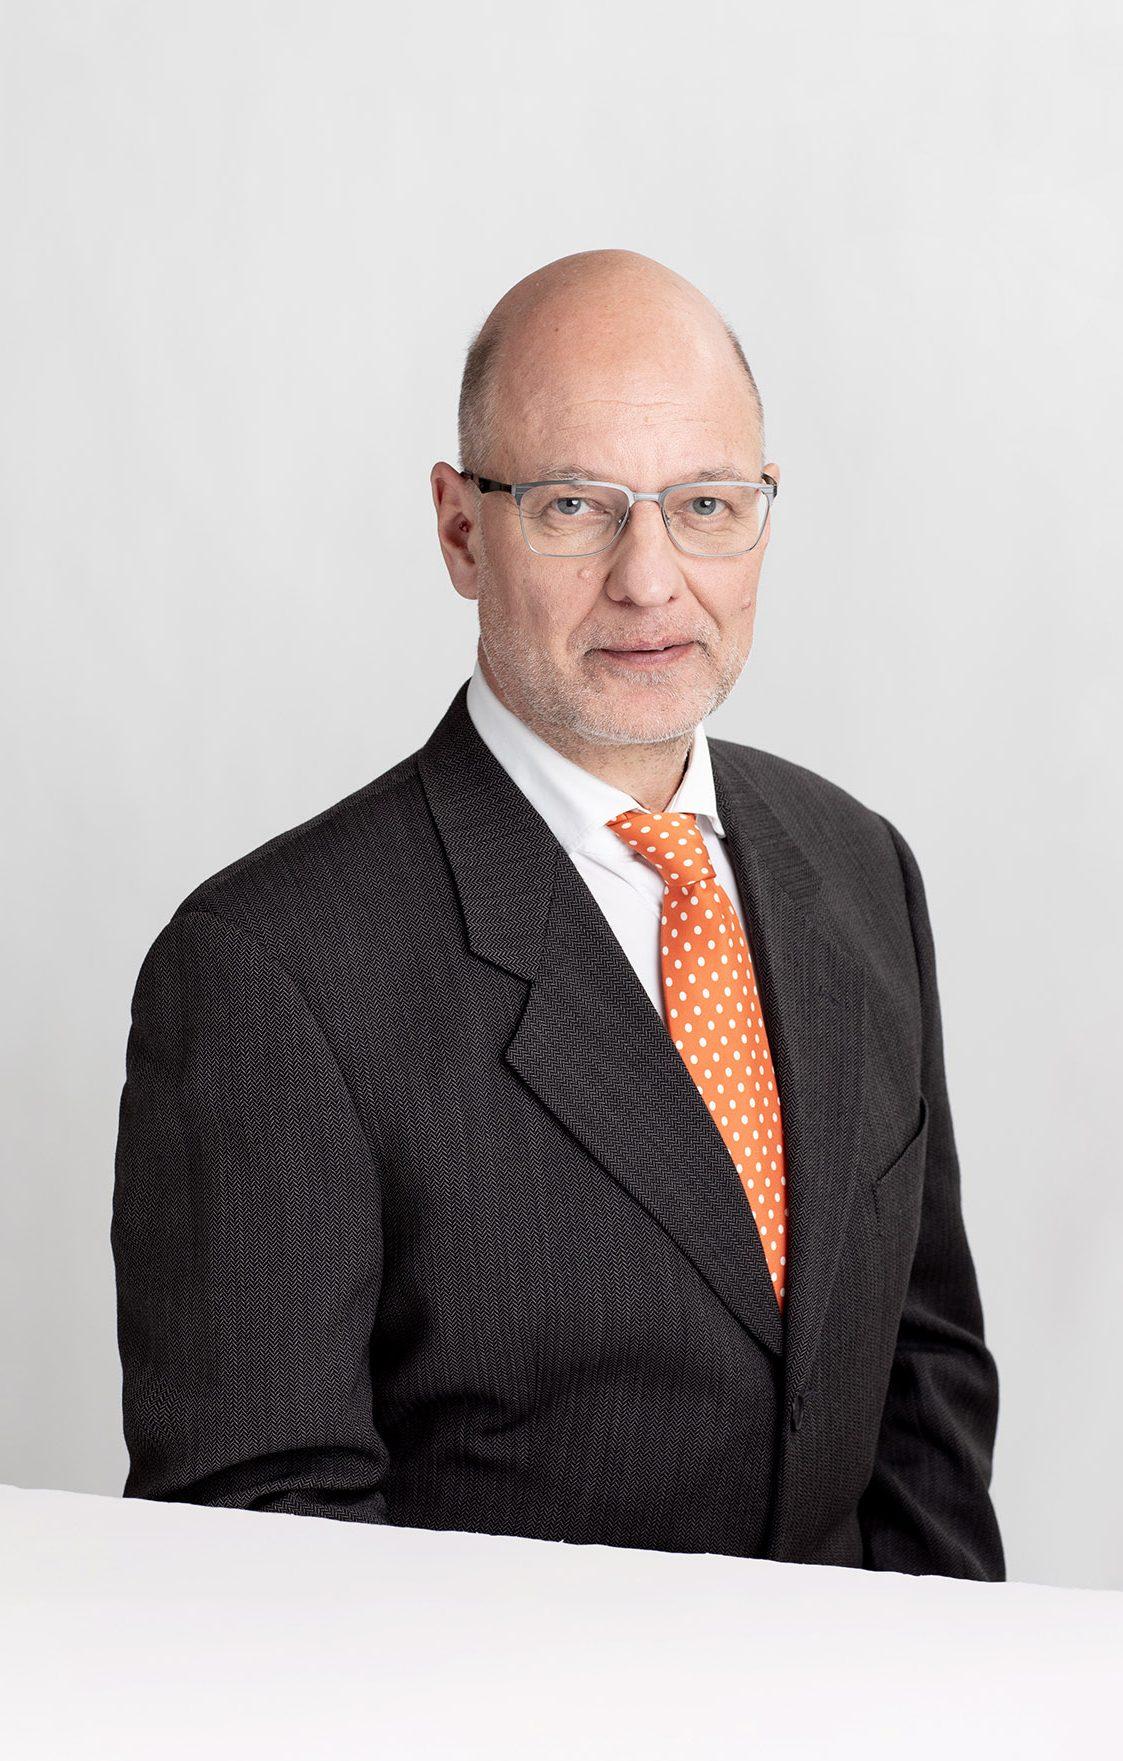 Kristian Luoto